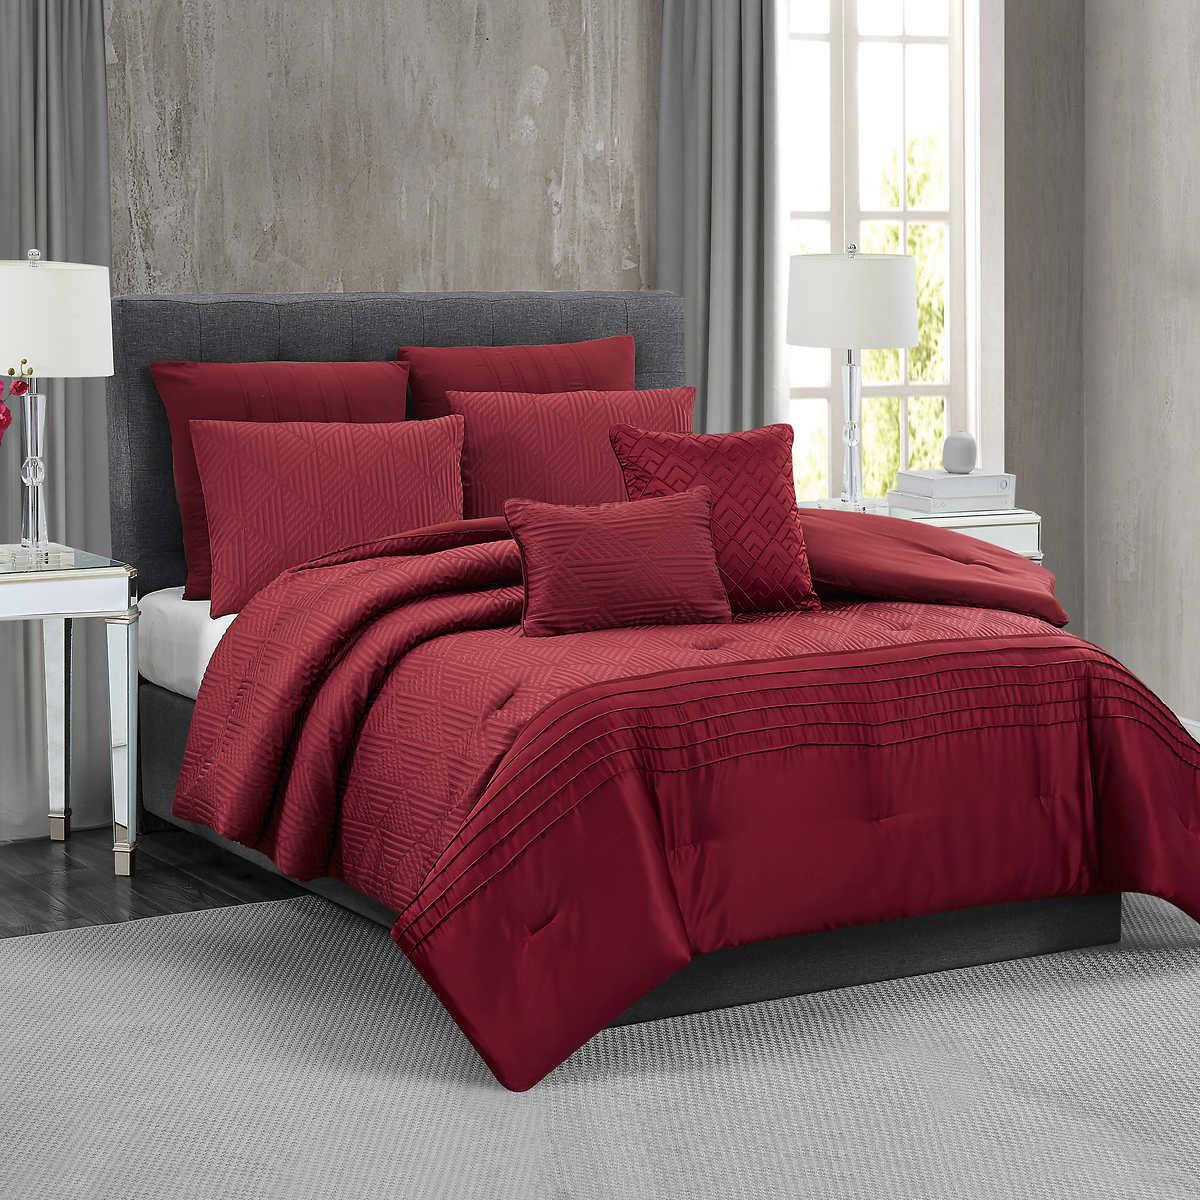 Fifth Avenue Lux Noelle 7 Piece Comforter Set Red